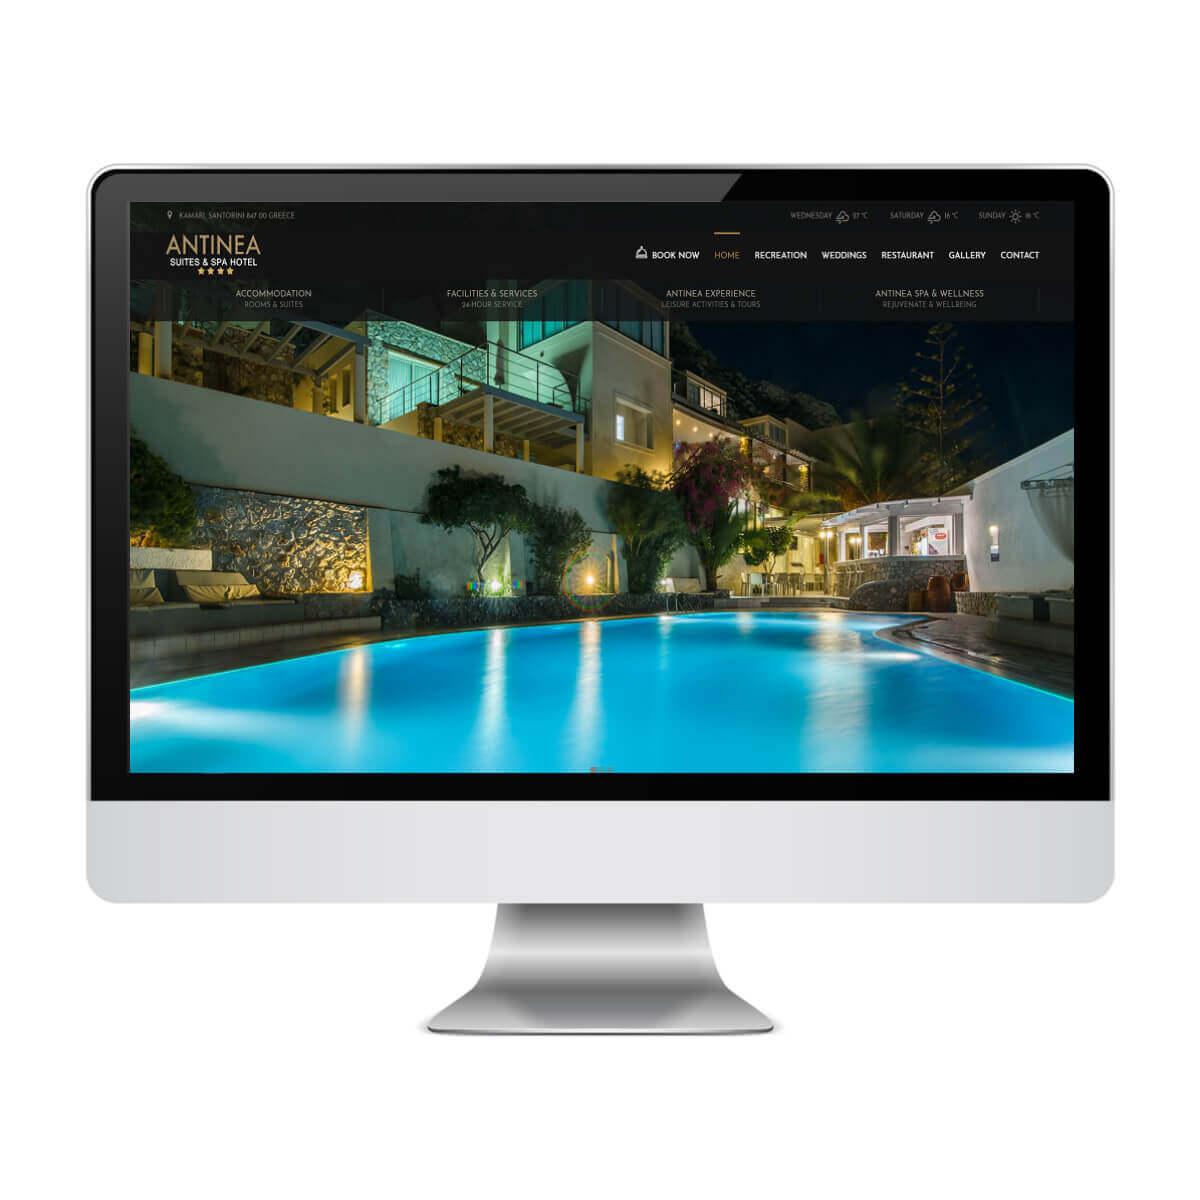 Antinea - Κατασκευή Ιστοσελίδων για Ξενοδοχεία - SmartWebDesign